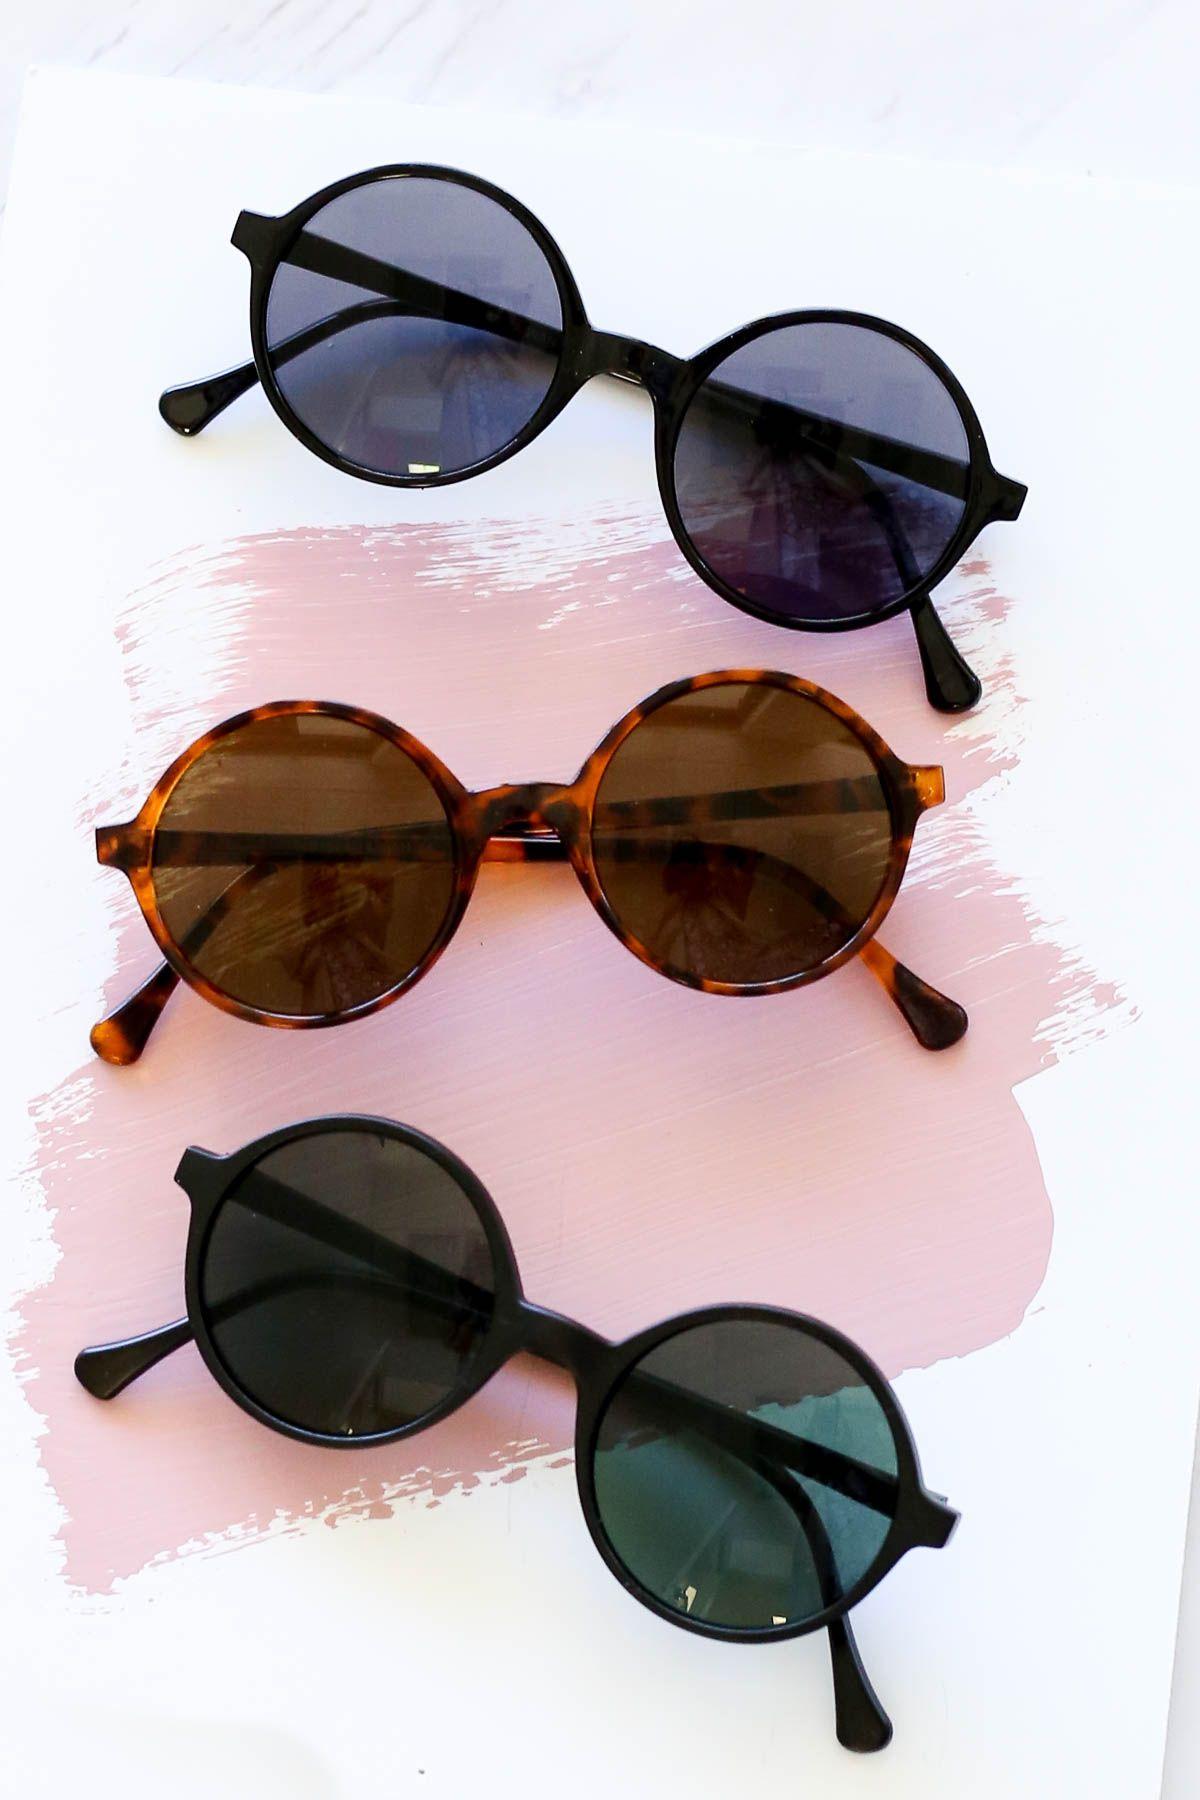 Tezza Round Sunglasses Sunnies Summer Brunch Outfit Summer Brunch Outfit Sunglasses